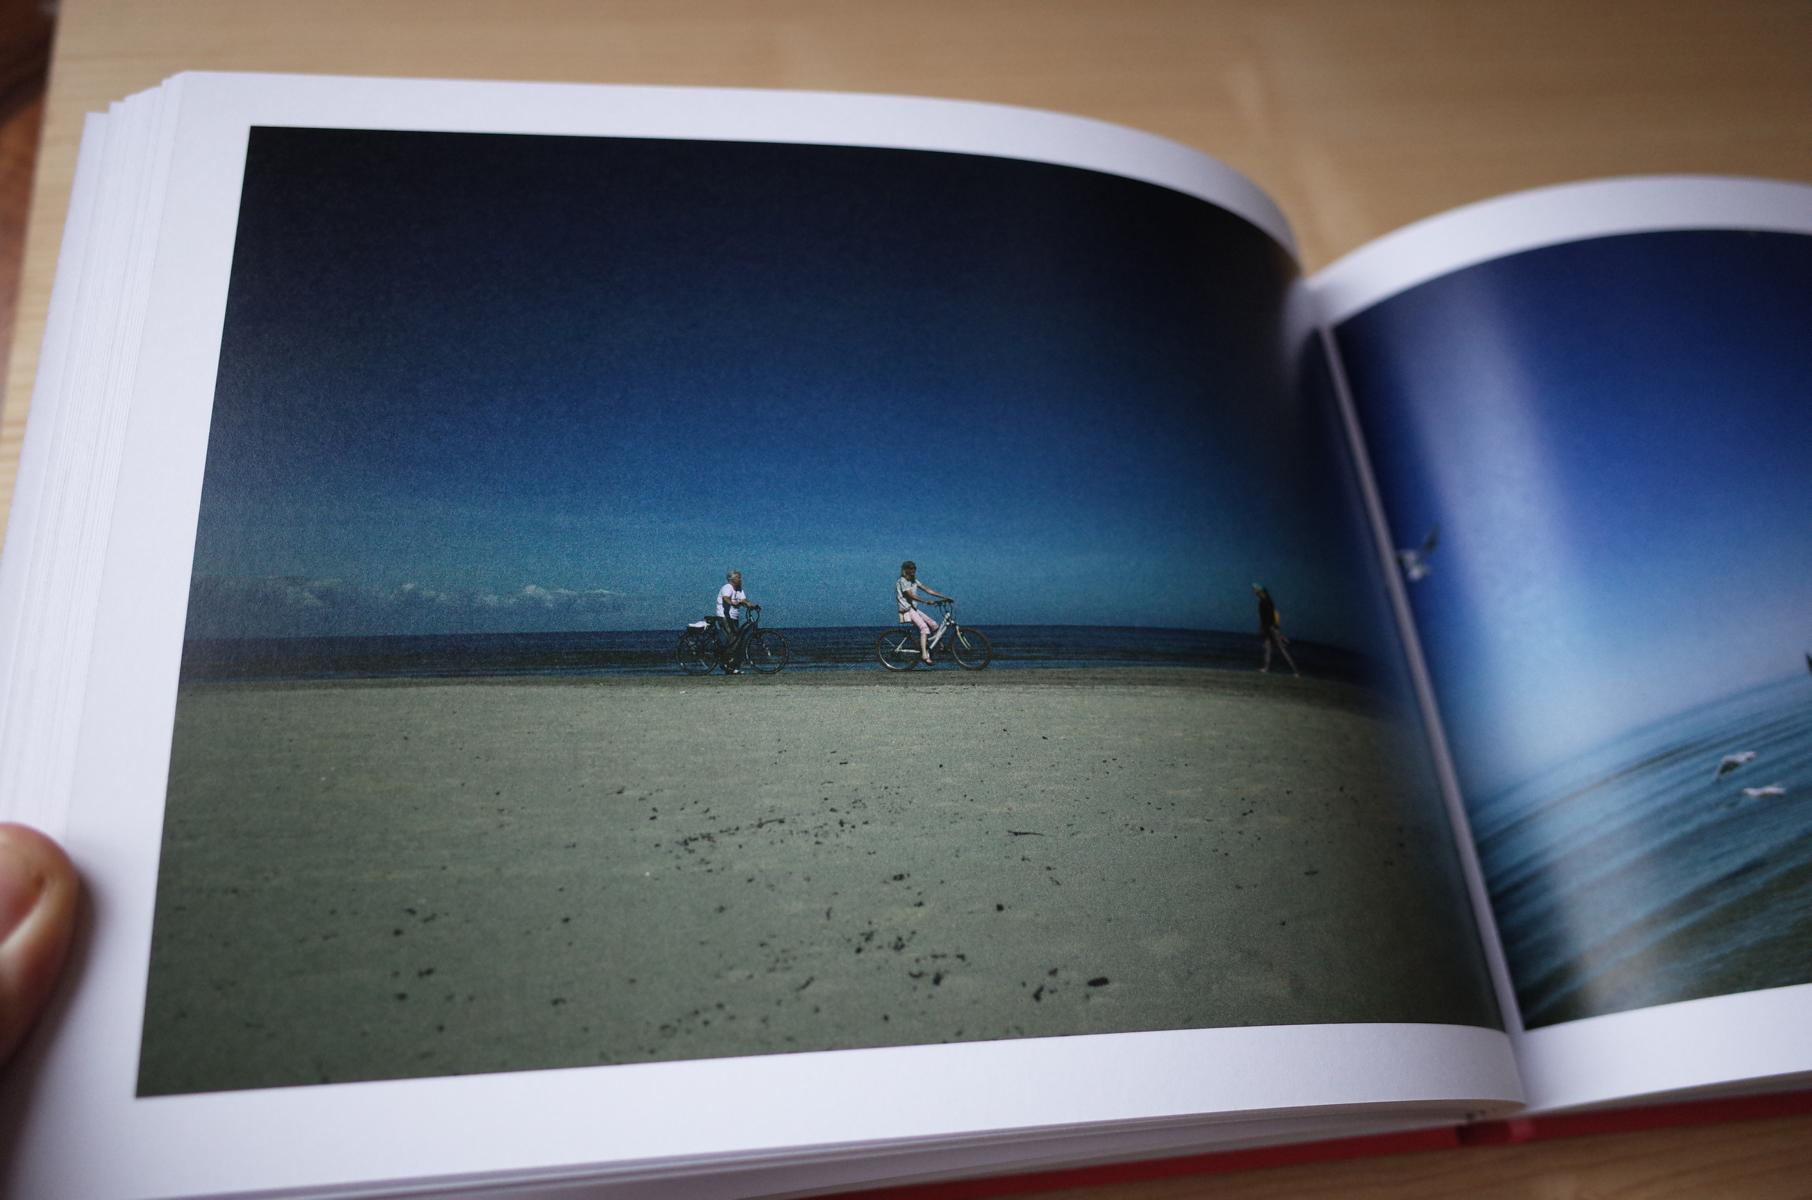 Strandfoto im Buch über Riga